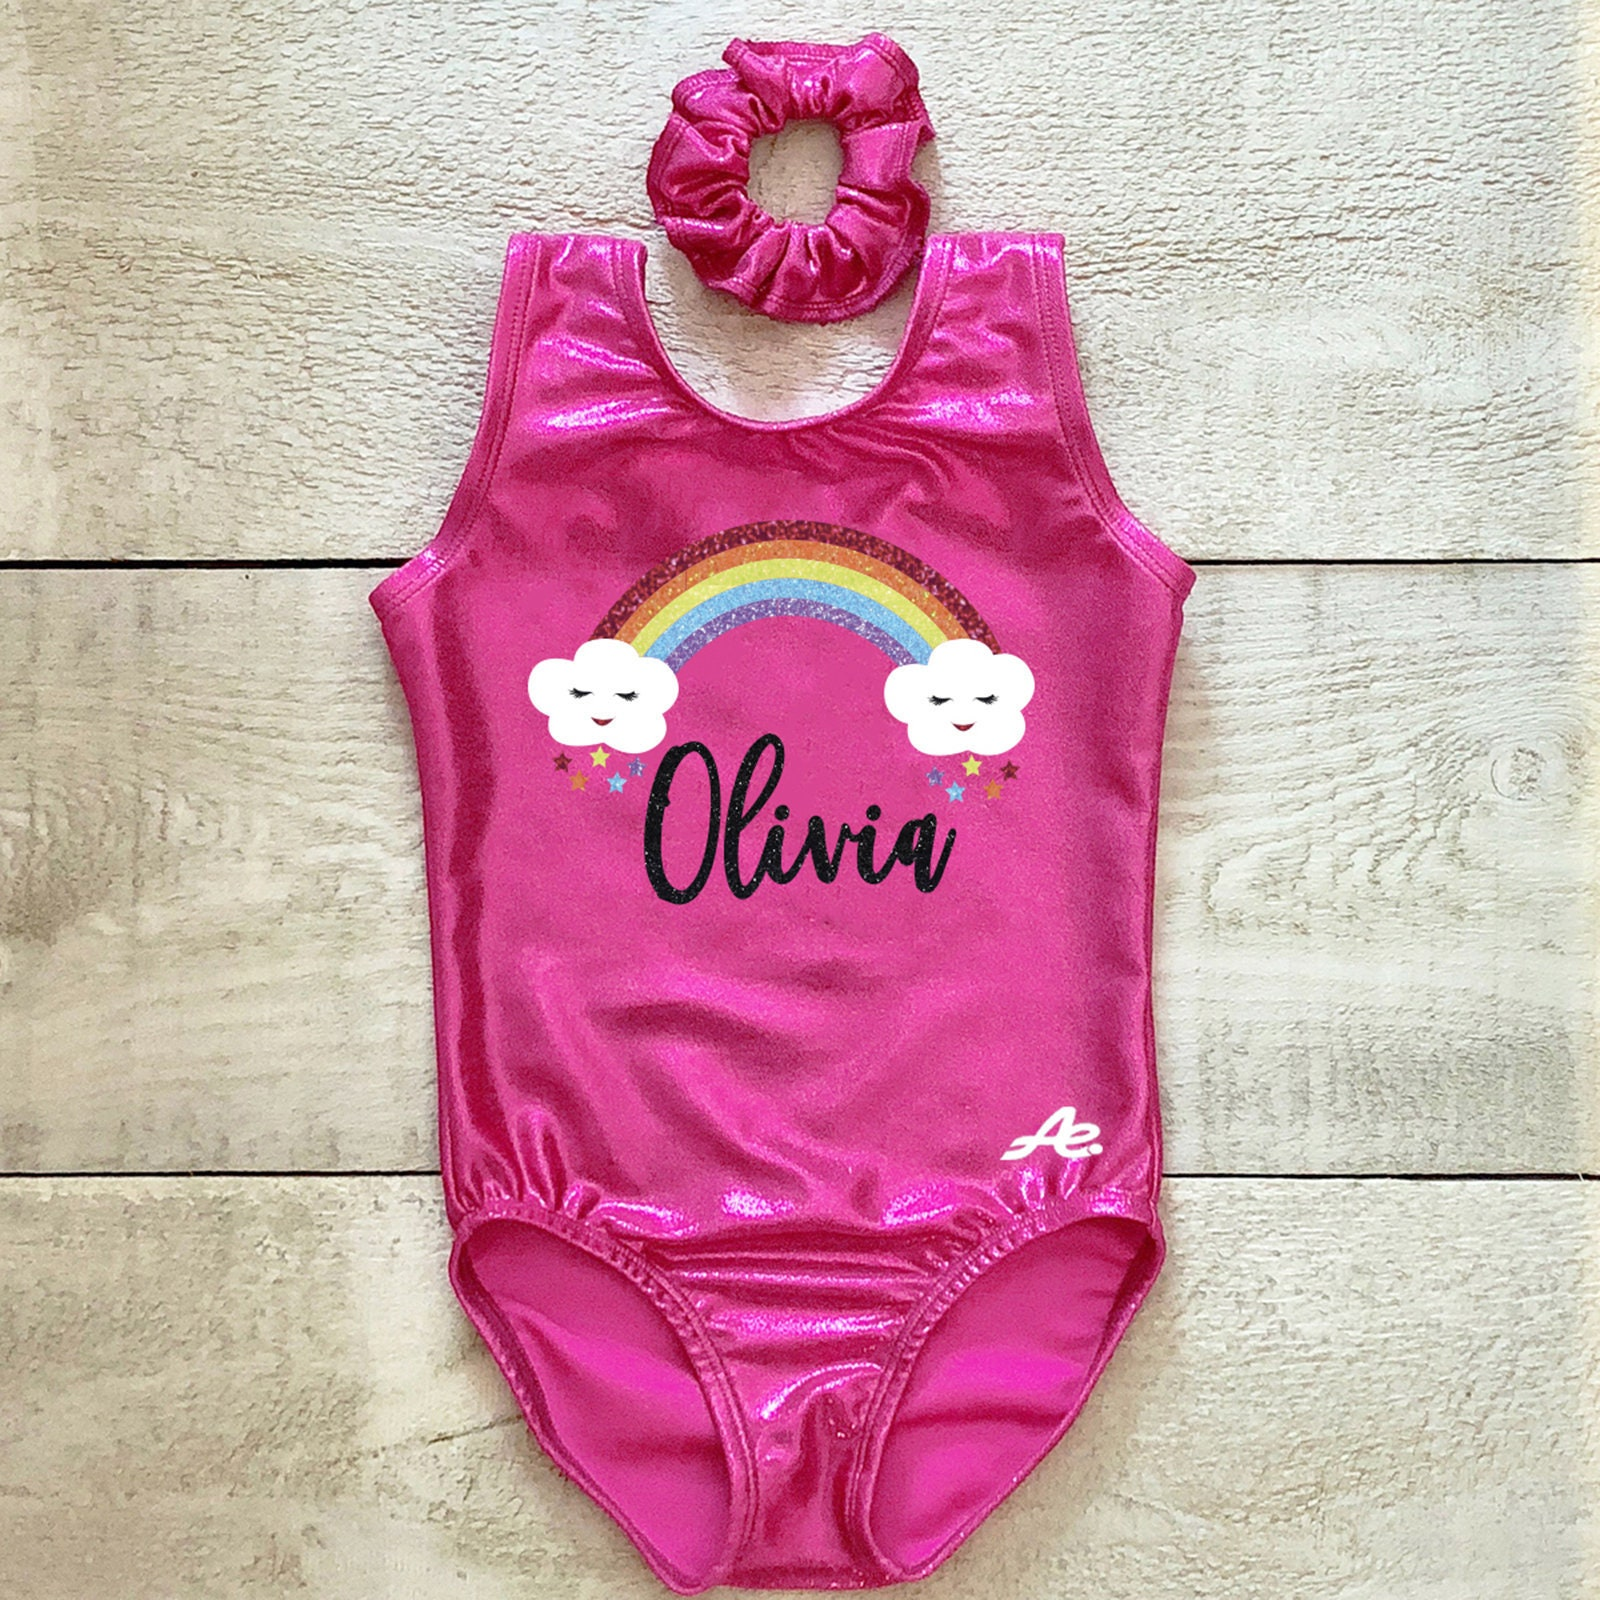 Personalized Gymnastic Gymnast Girls Hot Pink Tumbling Leotard Size Medium 2-4T